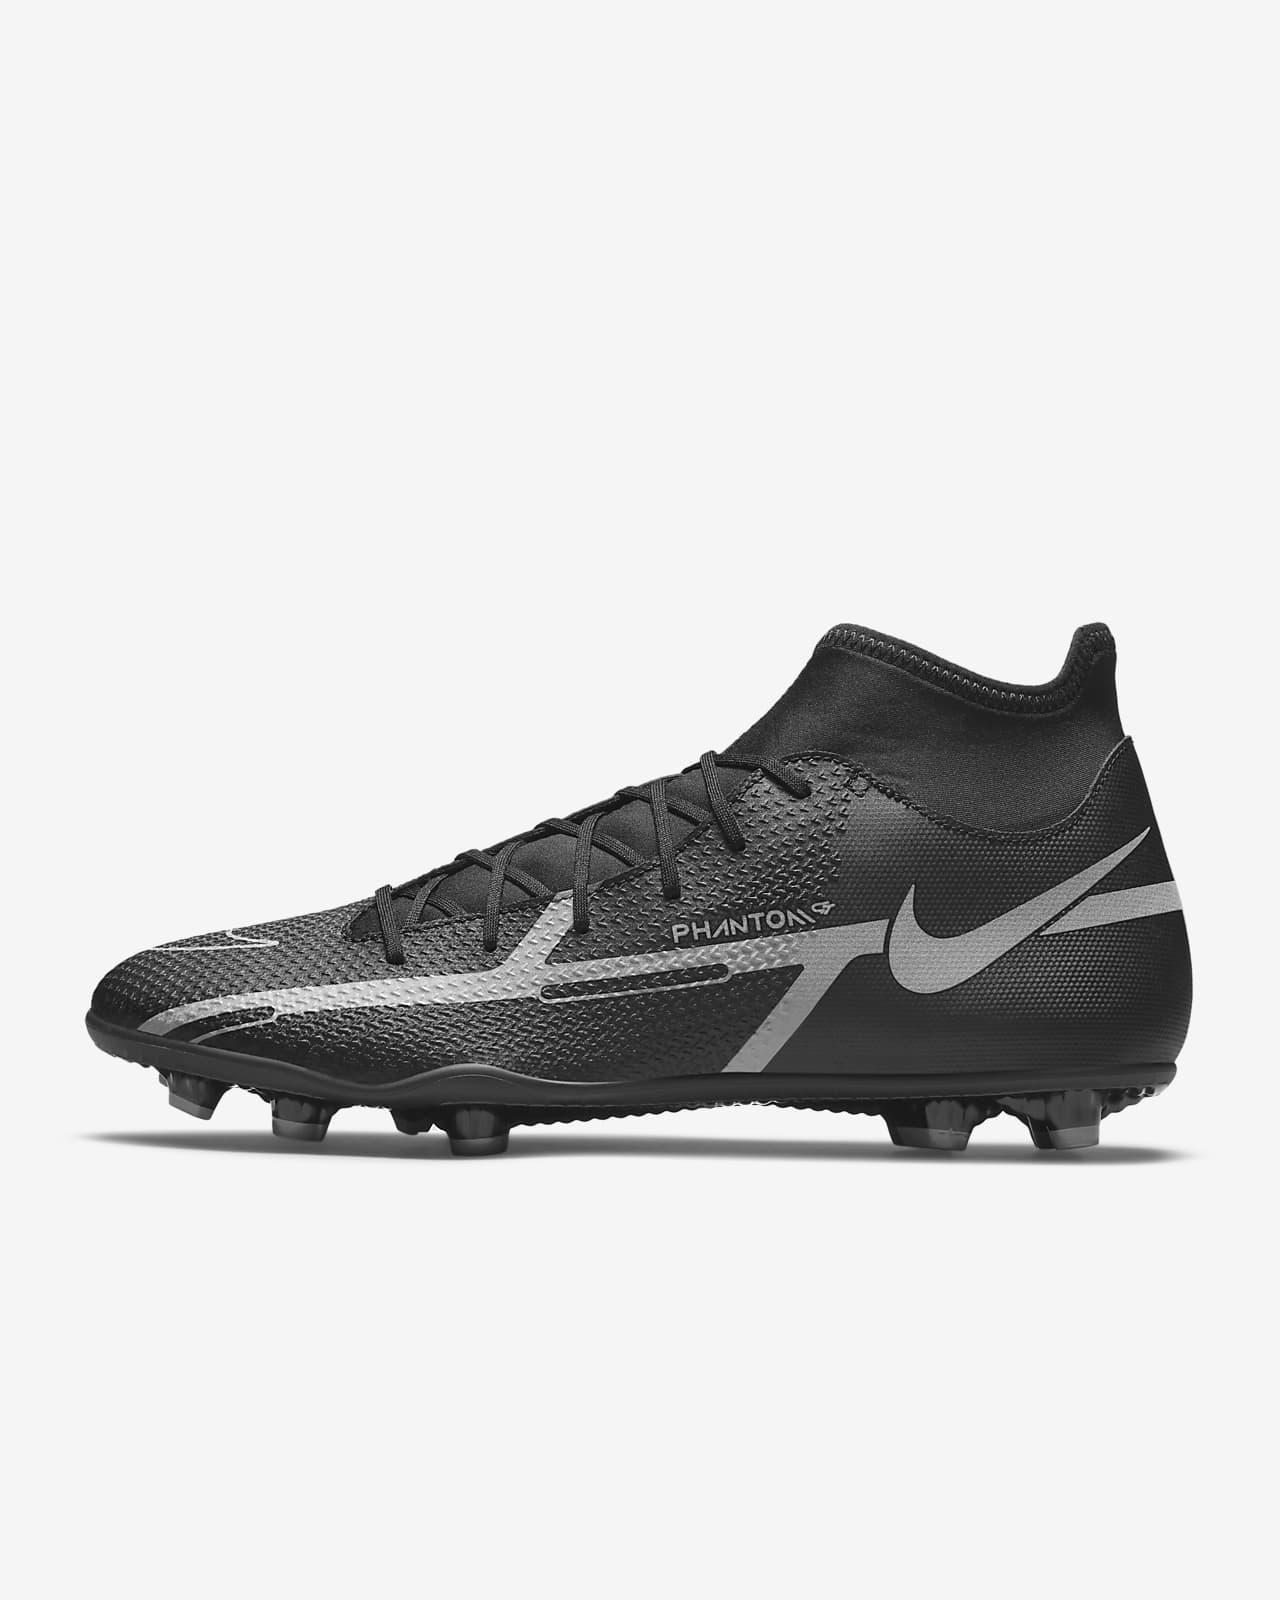 Nike Phantom GT2 Club Dynamic Fit MG Multi-Ground Football Boot